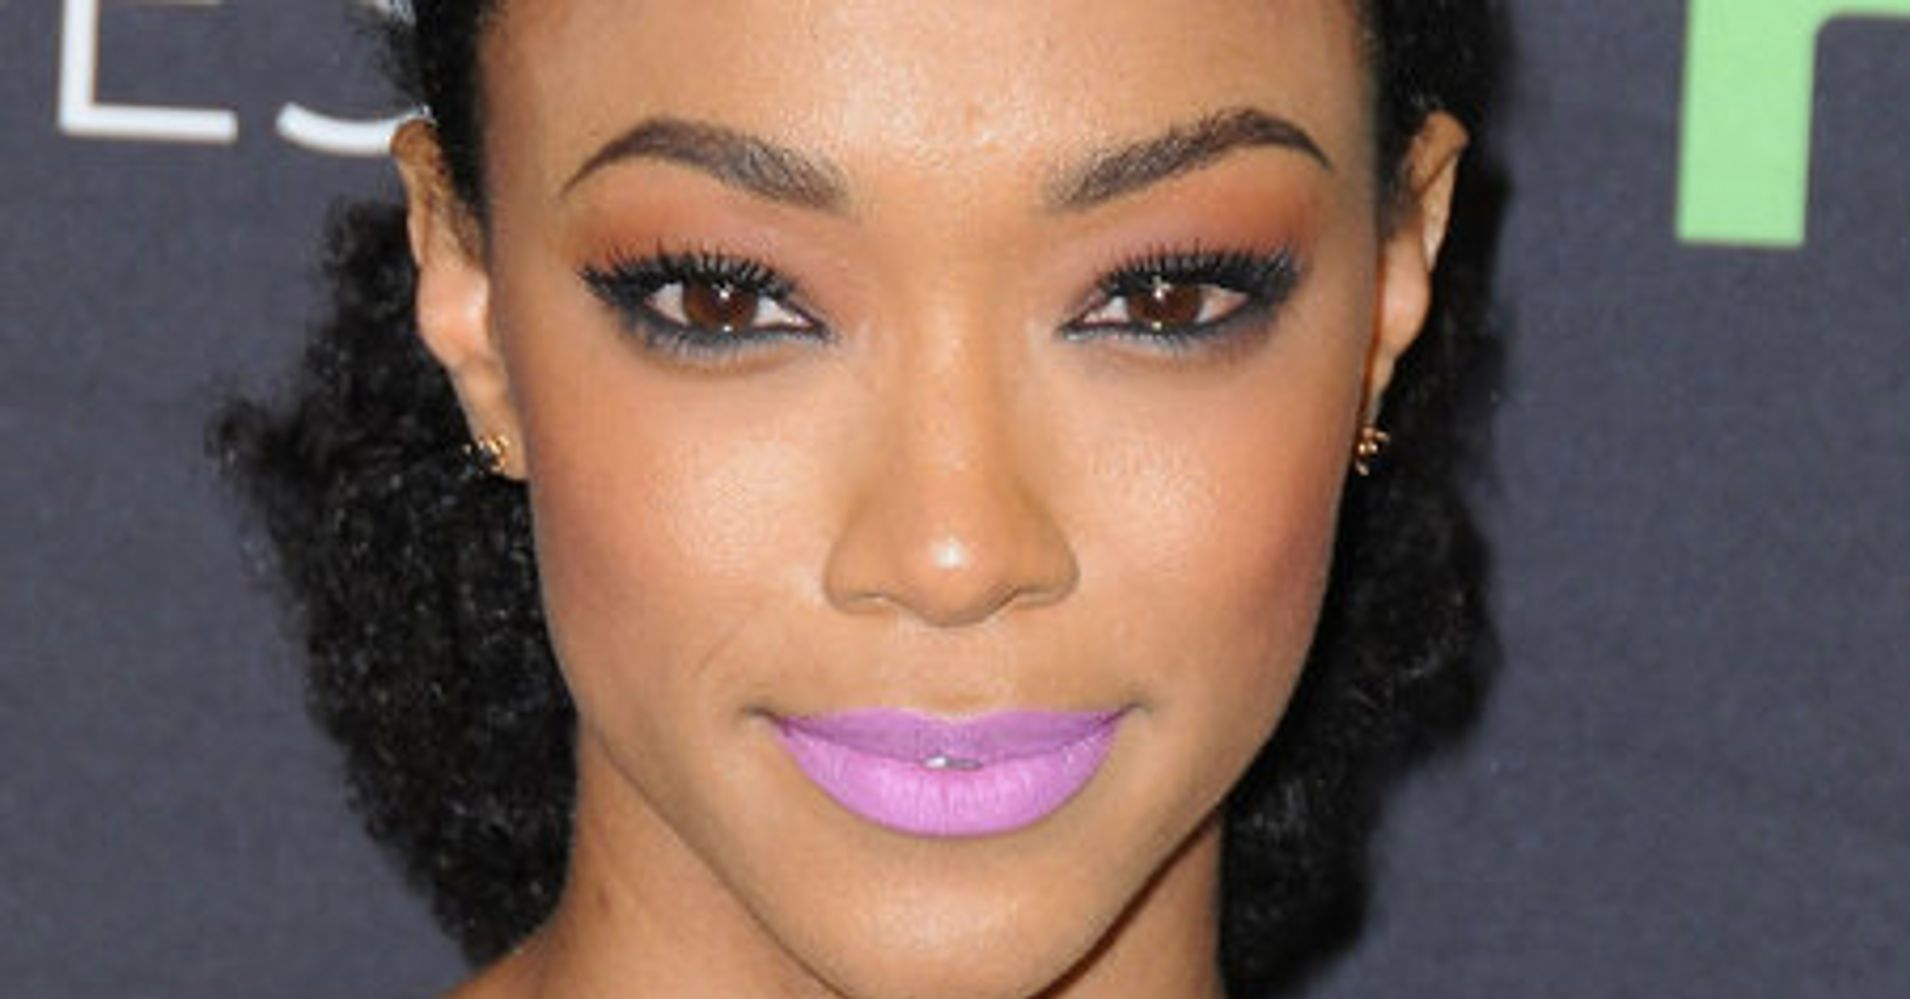 Sonequa Martin-Green Of 'Star Trek: Discovery' Shuts Down Racist Trolls